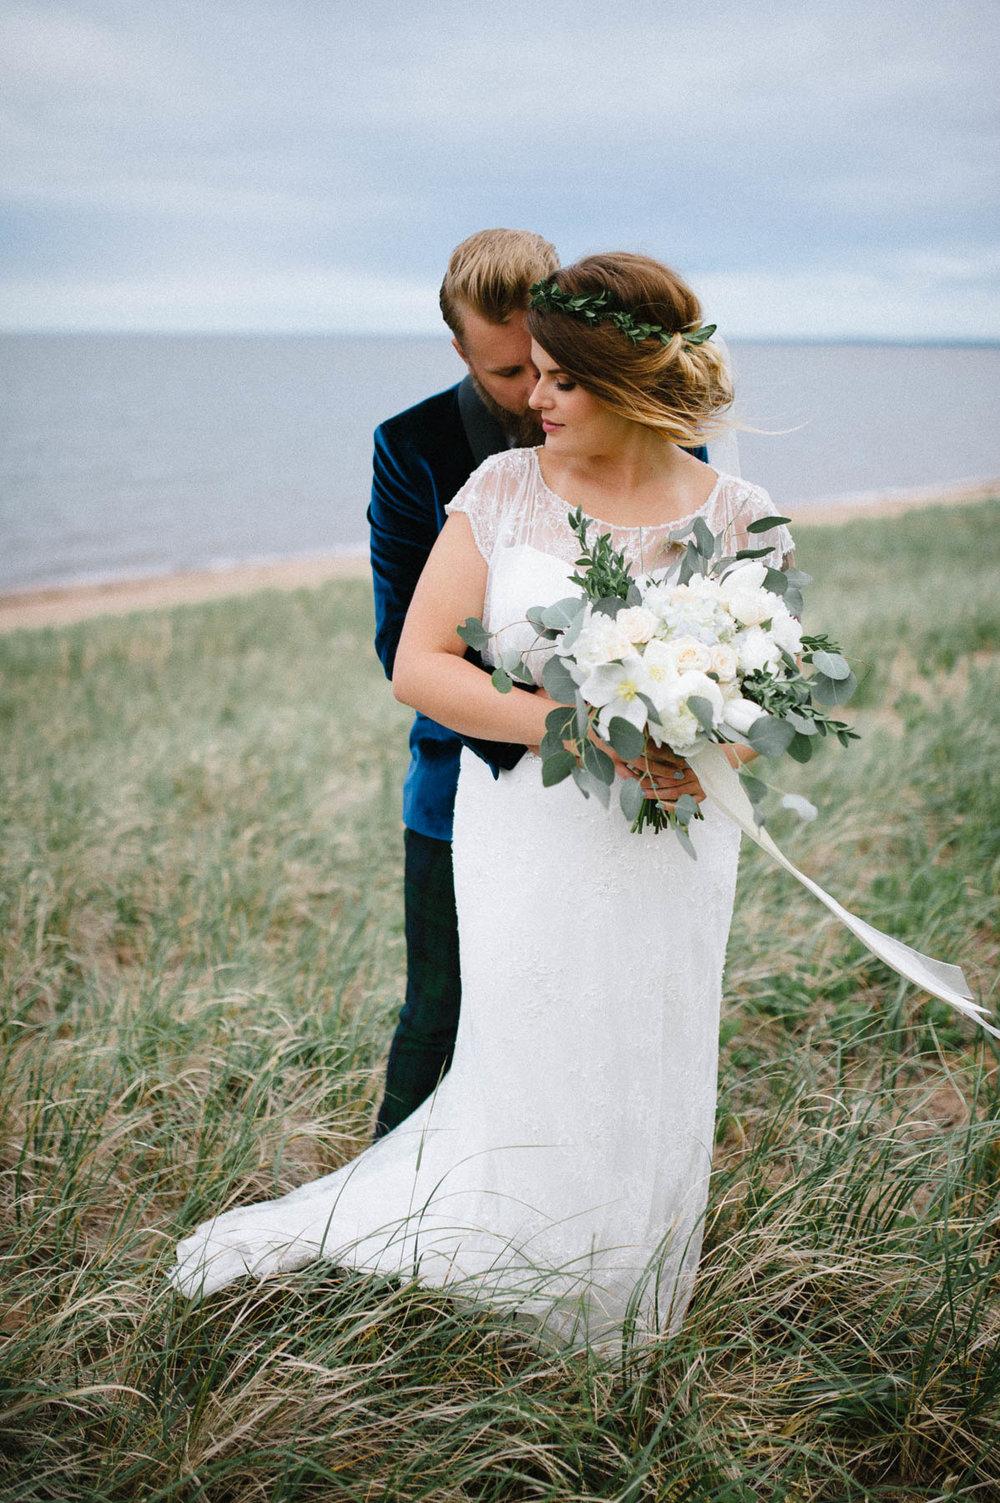 22-moody wedding photography amanda afton perth.jpg